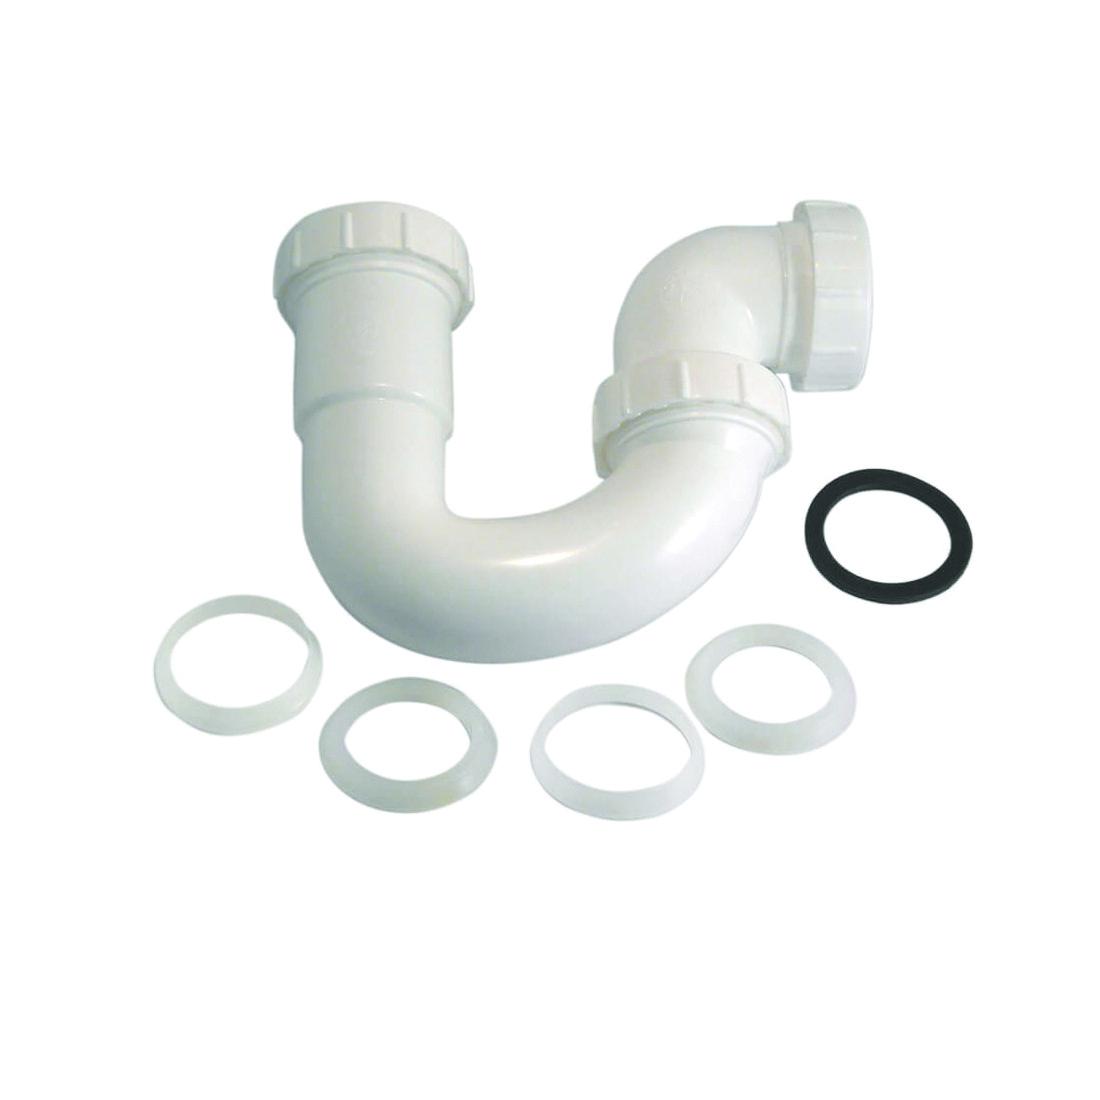 Picture of Danco 94005 Swivel P-Trap, 1-1/2 in, Slip Joint, Plastic, White